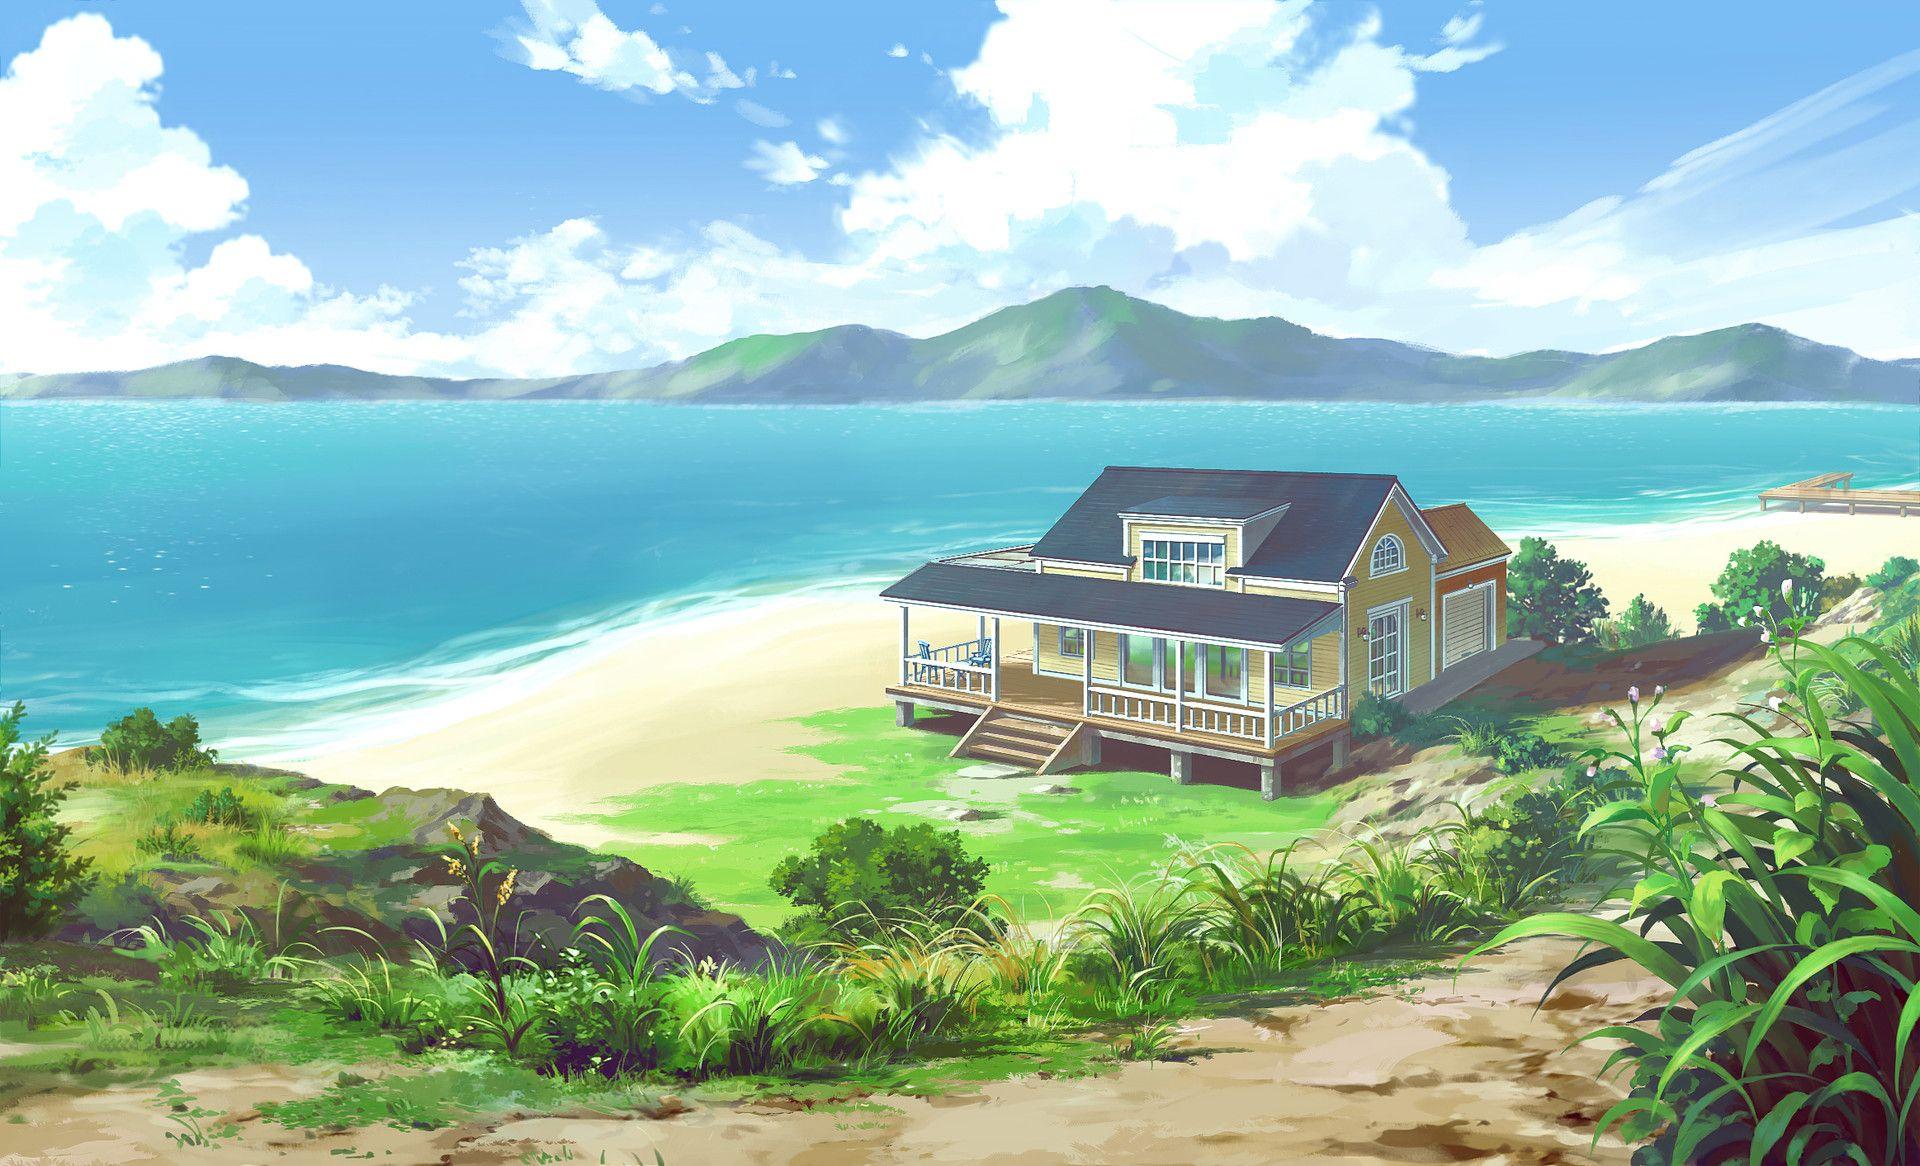 city in the sky anime Google Search Anime scenery, Sky